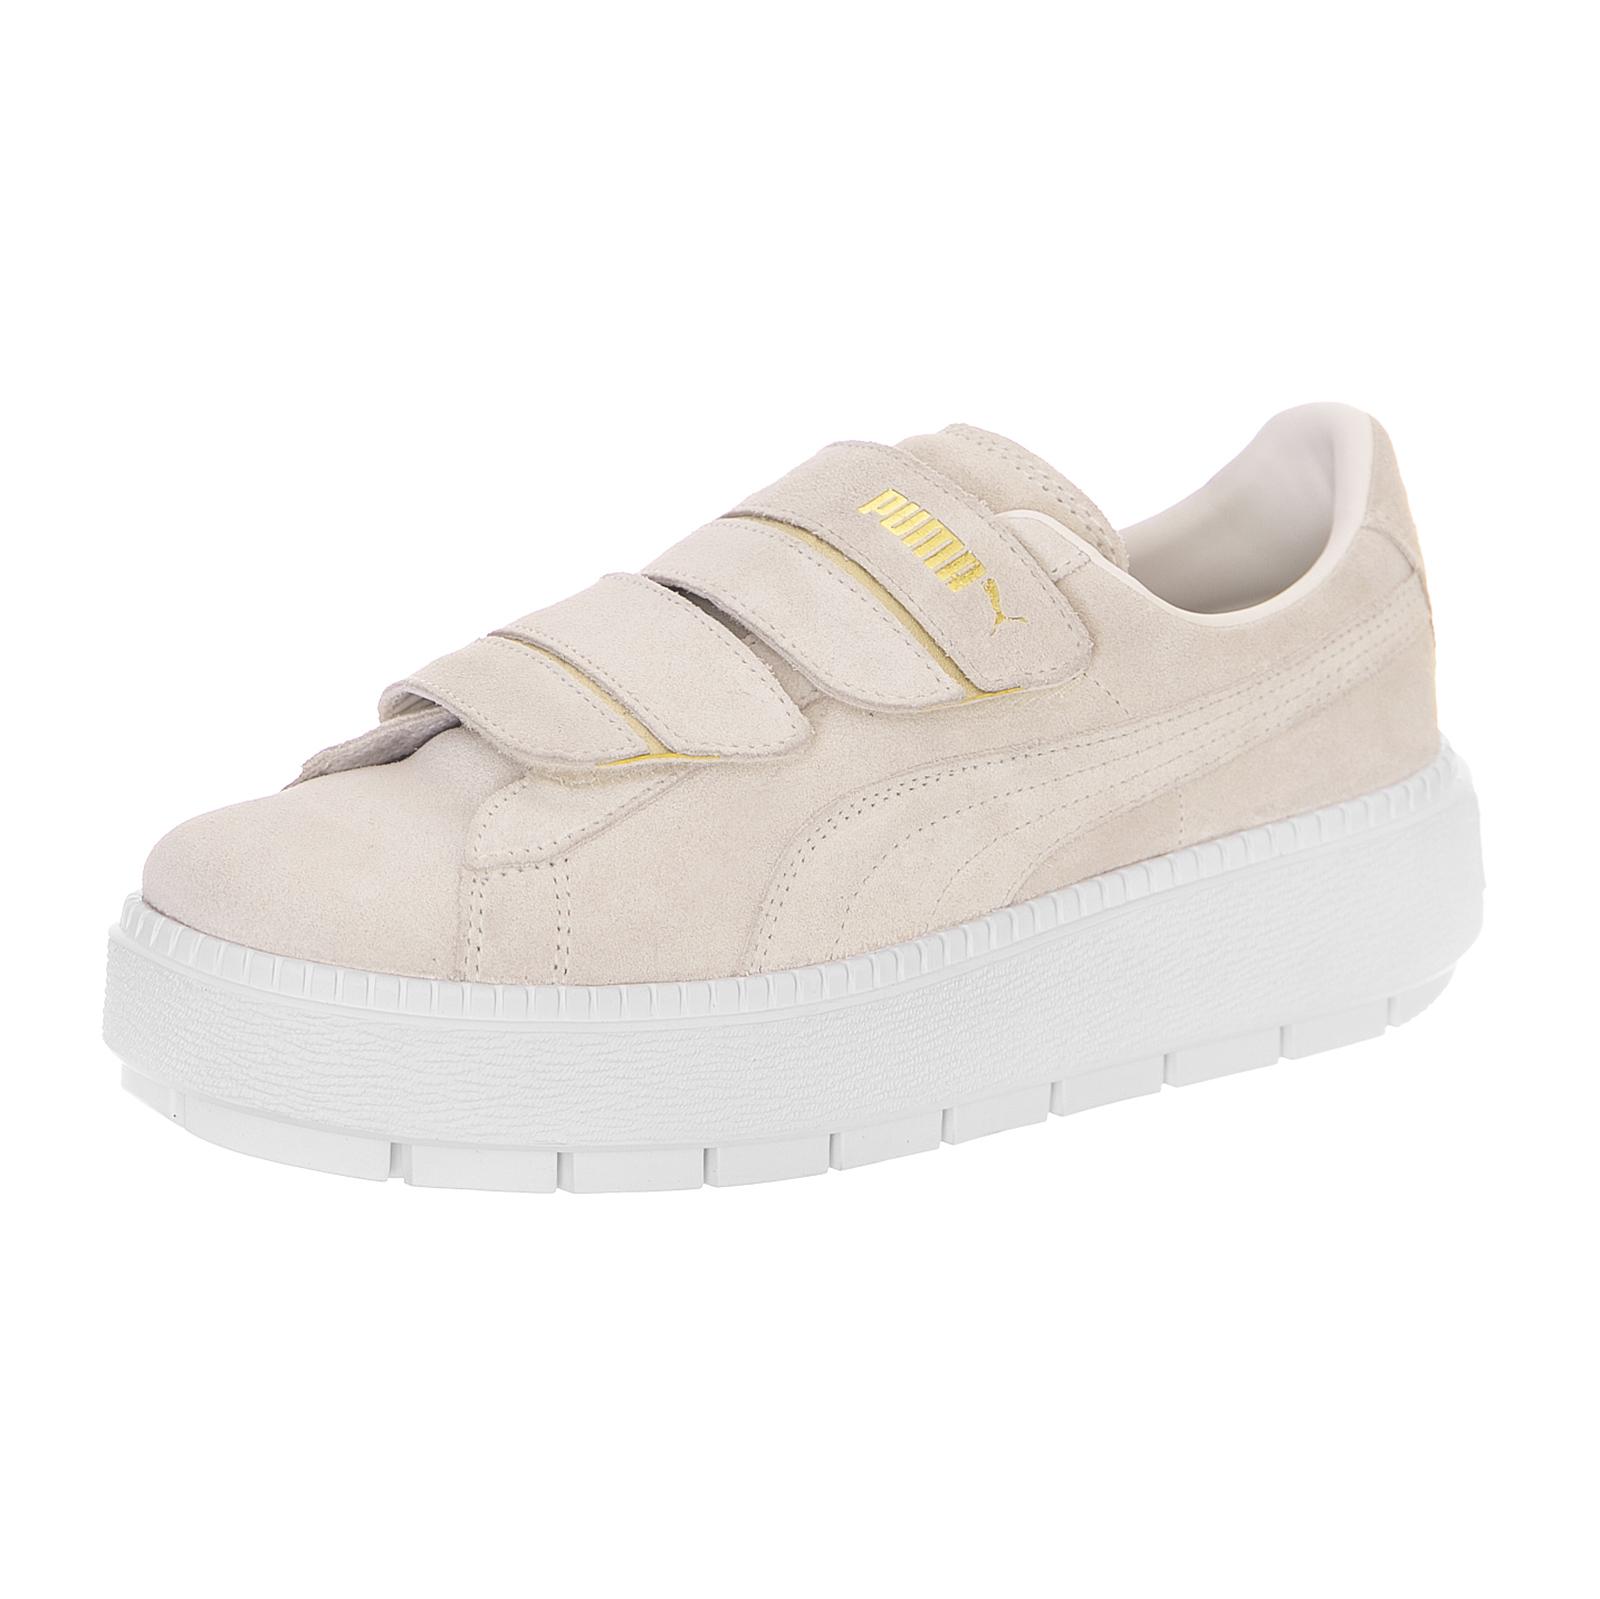 Puma Baskets Platform Trace Sangle Wn S Whisper Blanc Blanc